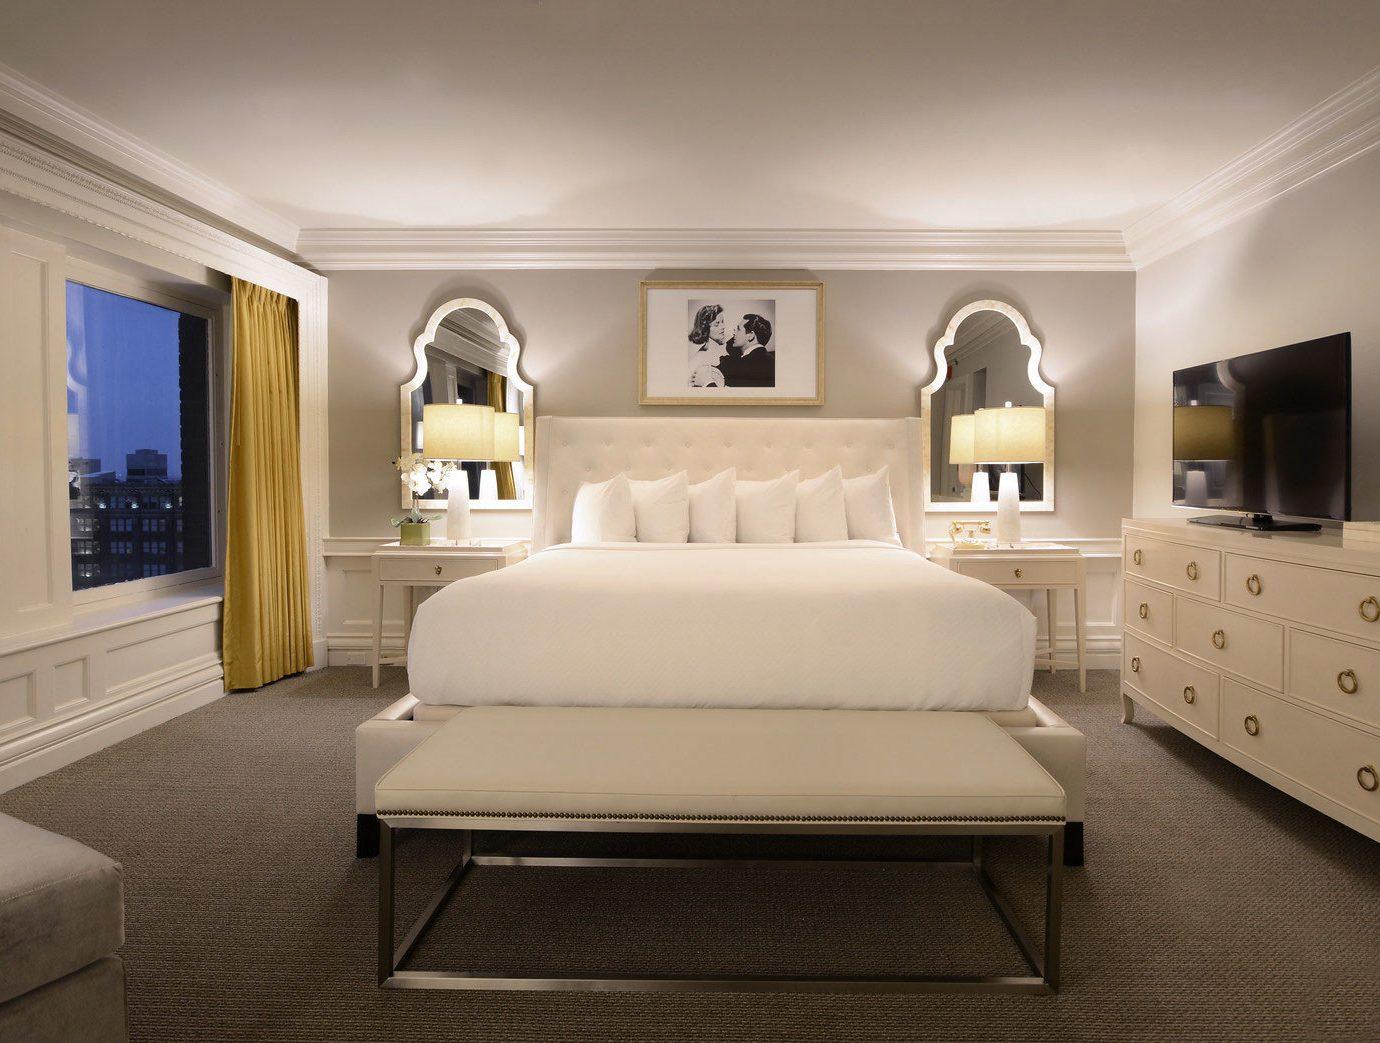 Bedroom Budget City Classic Elegant property living room home Suite bed frame